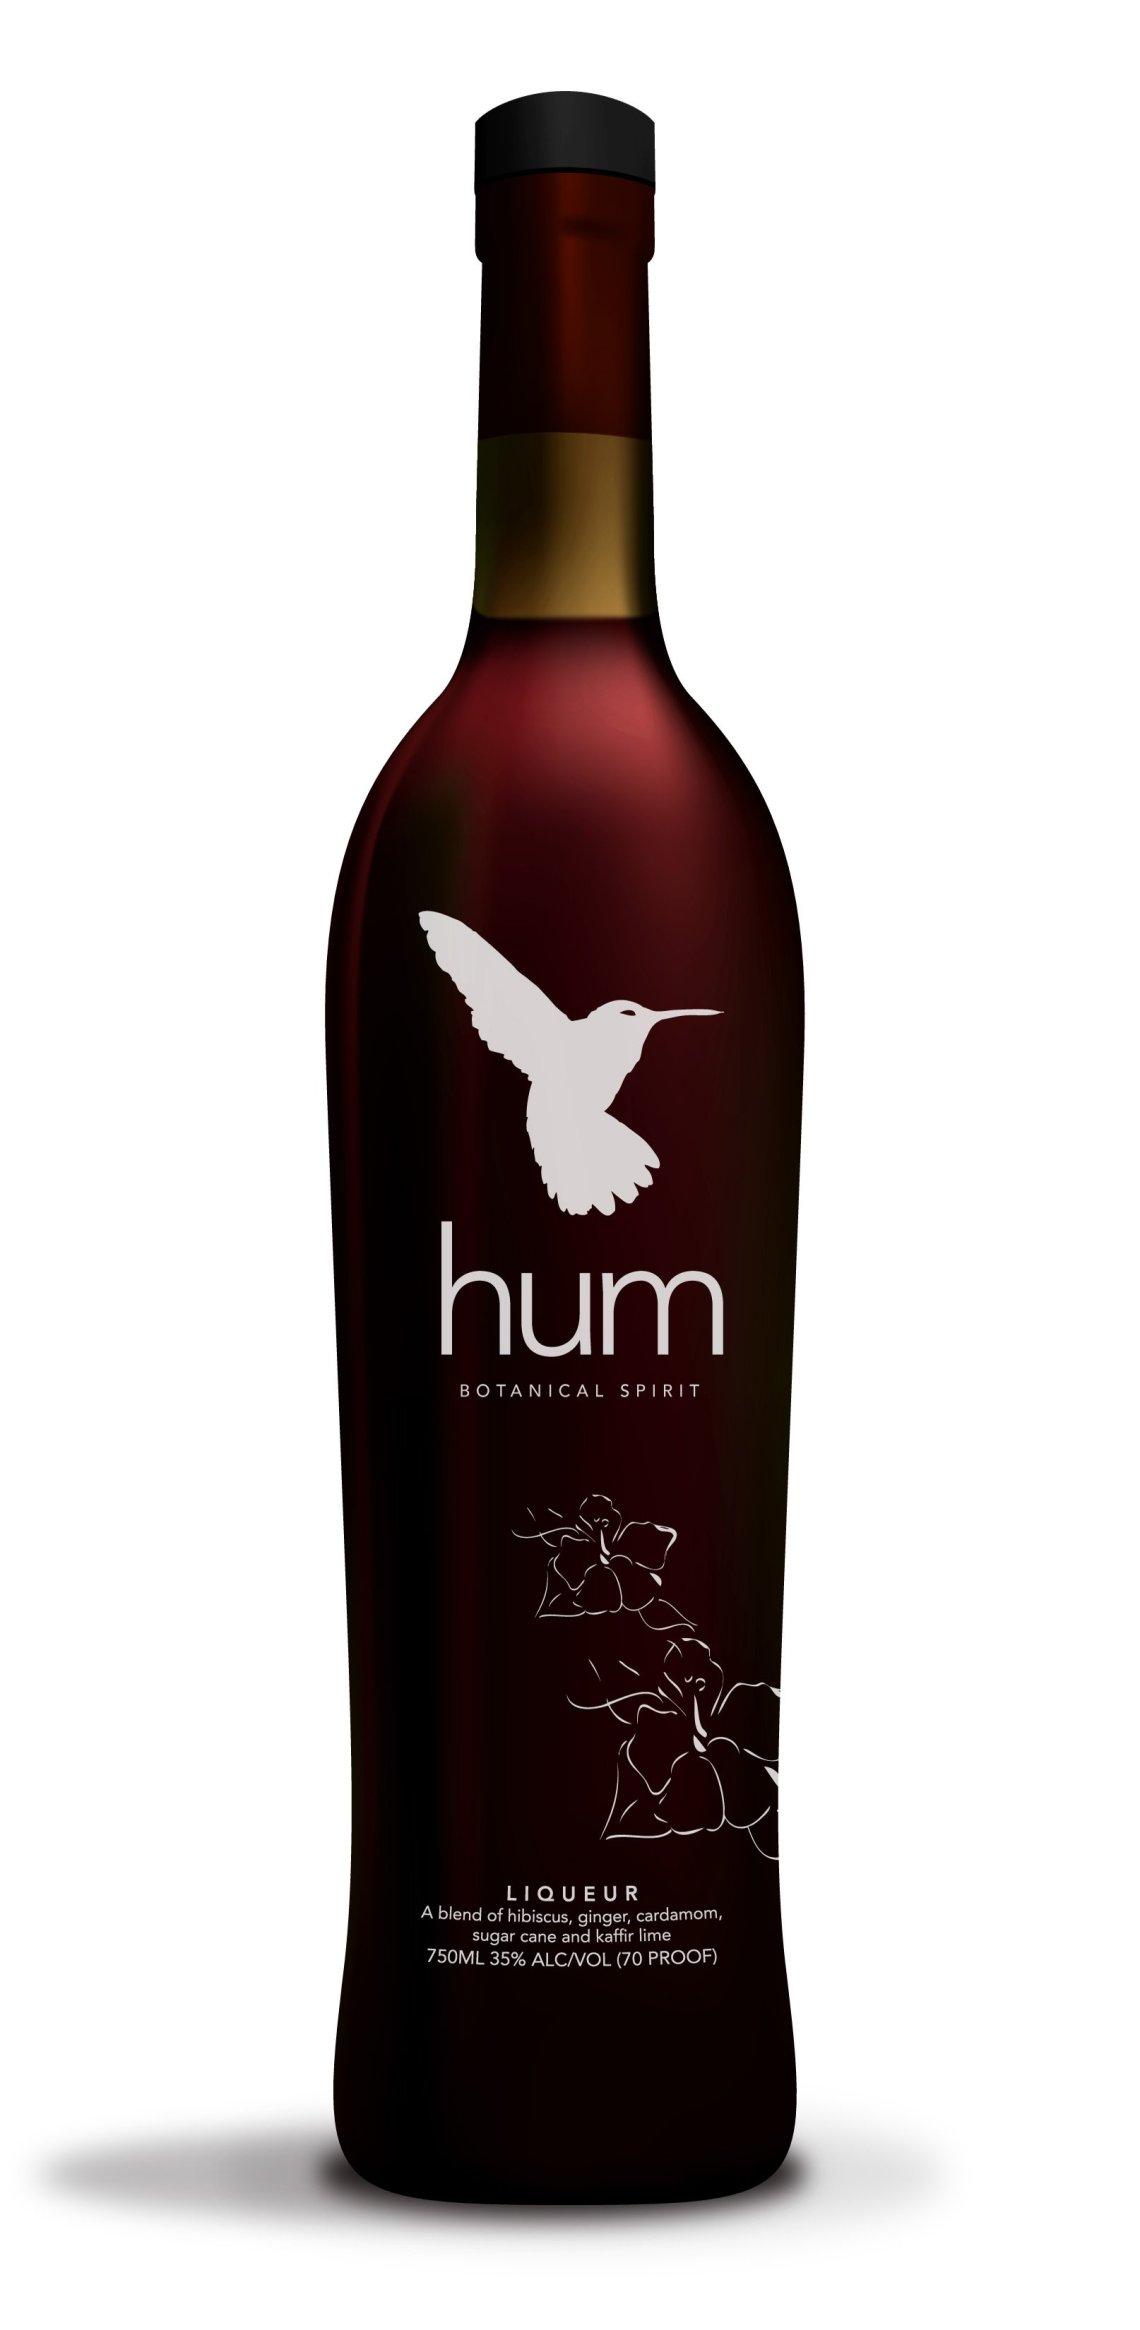 Hum Botanical Spirit Liqueur